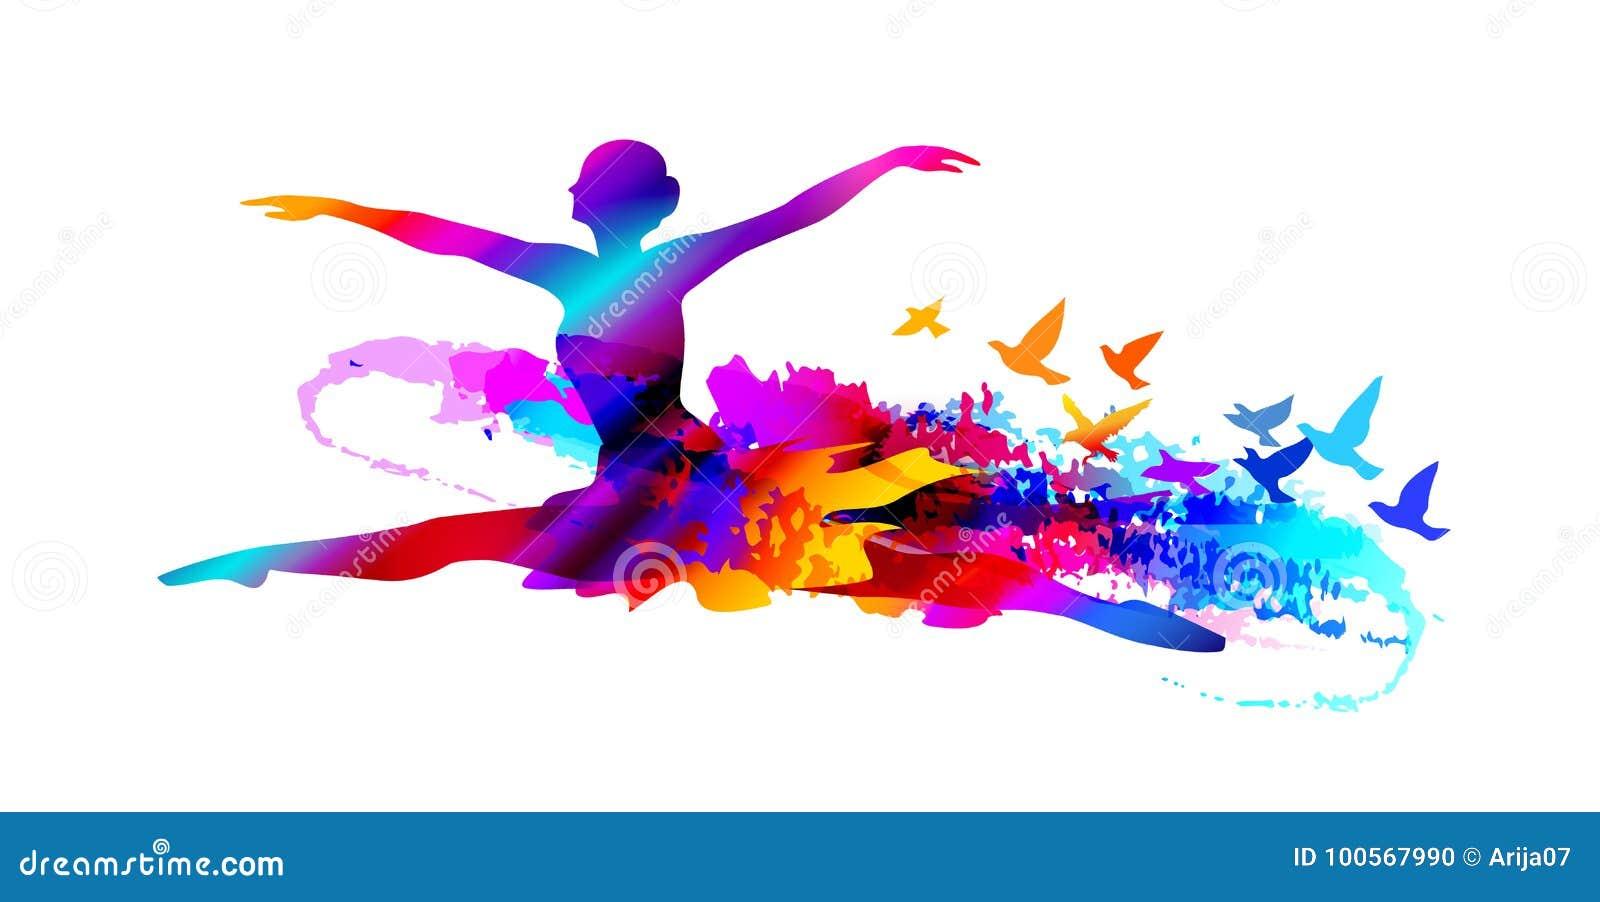 Красочный артист балета, цифровая картина с летящими птицами